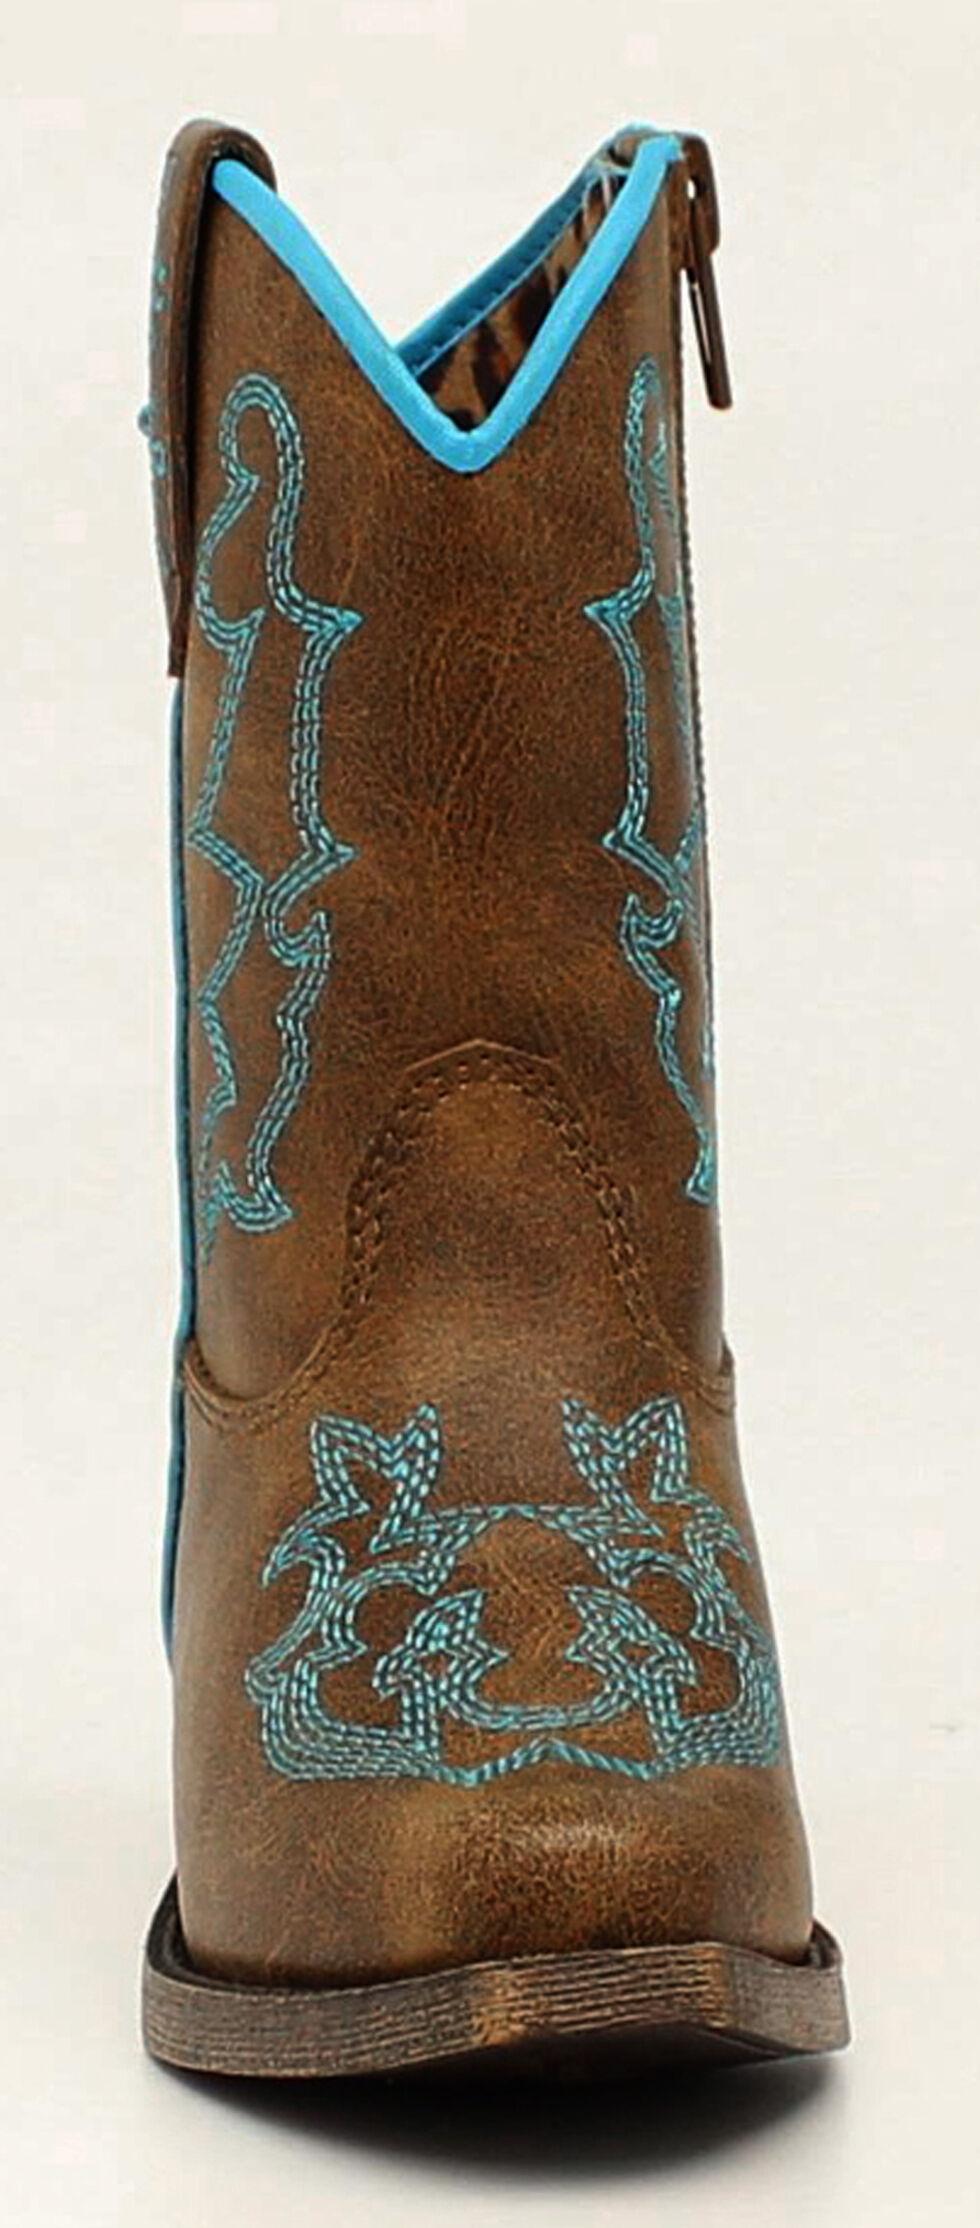 Blazin Roxx Toddler Girls' Caroline Cowgirl Boots - Snip Toe, Brown, hi-res